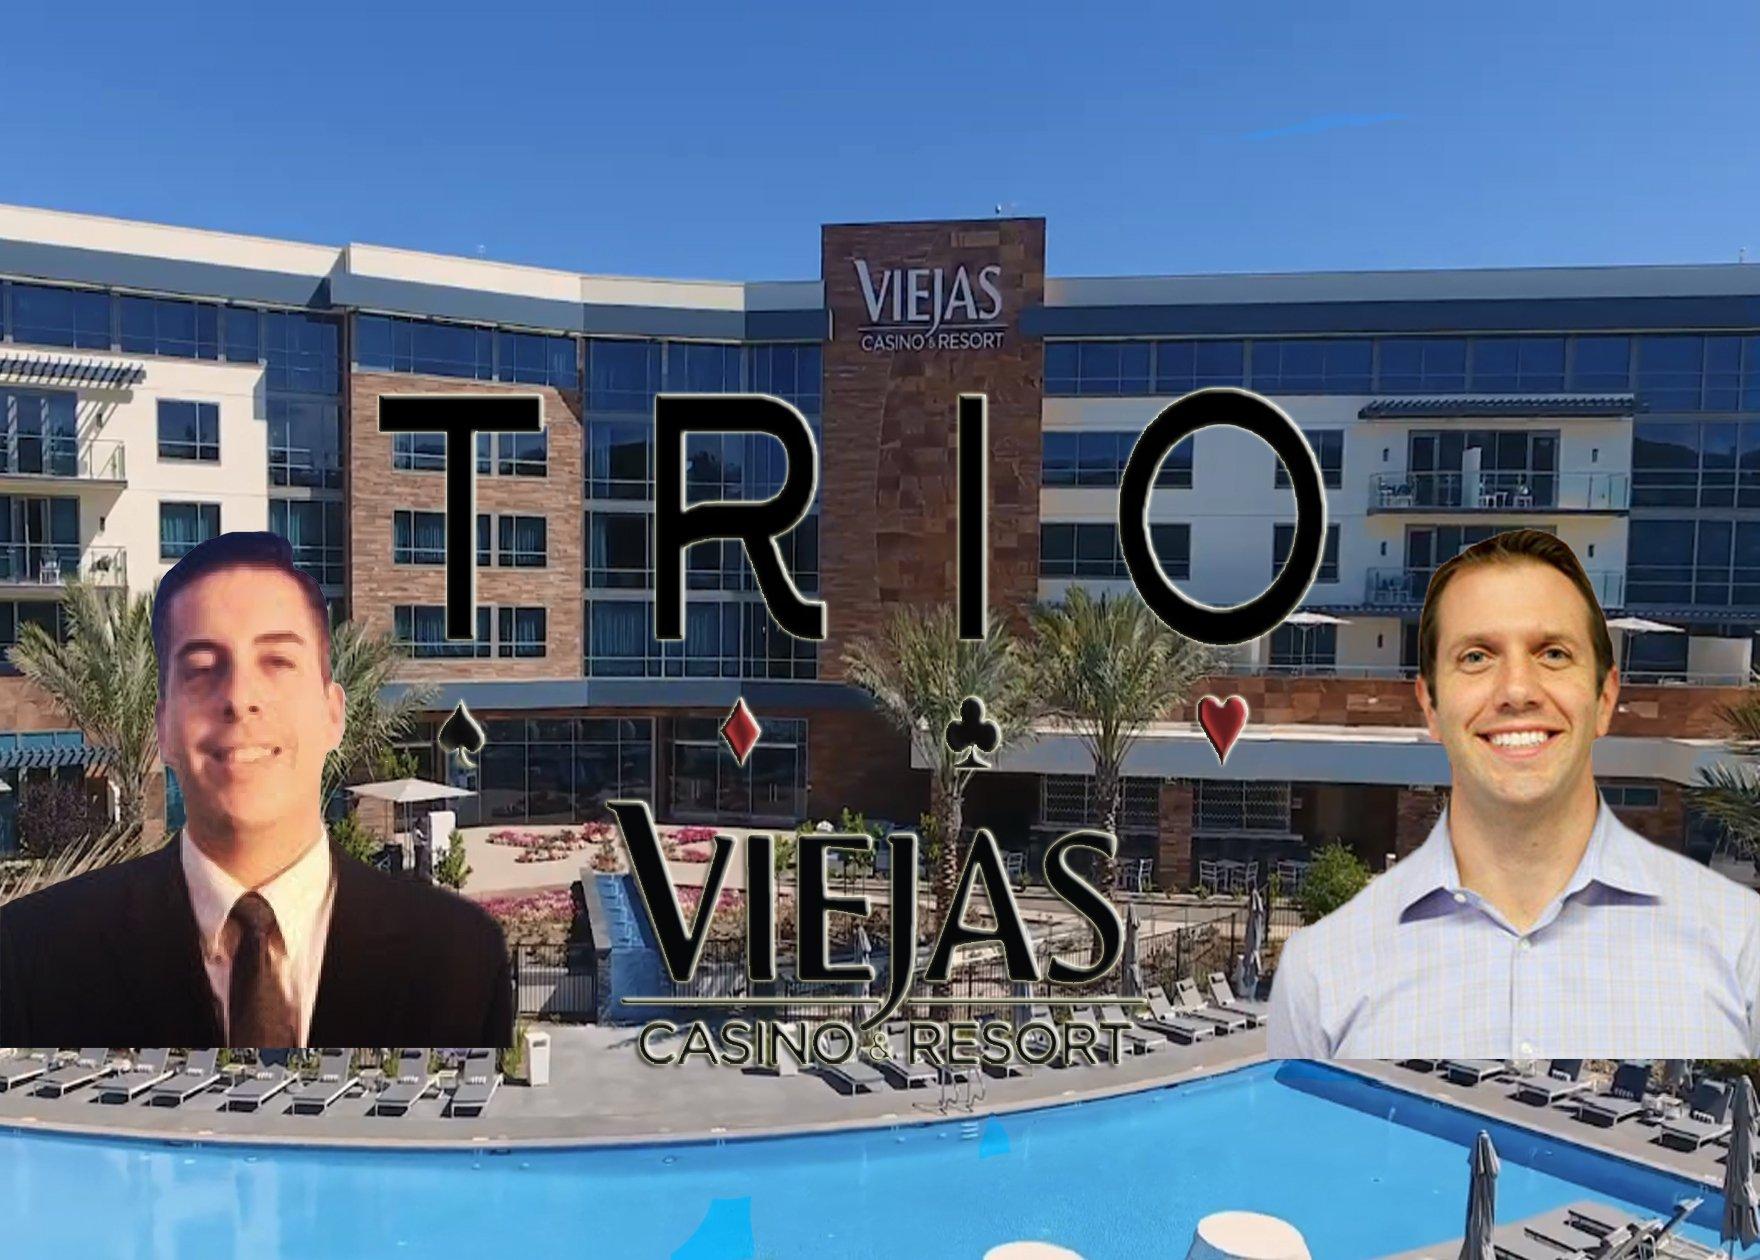 TRIO Testimonial: Alejandro Guardado- VP of Hotel Operations, Viejas Casino & Resort